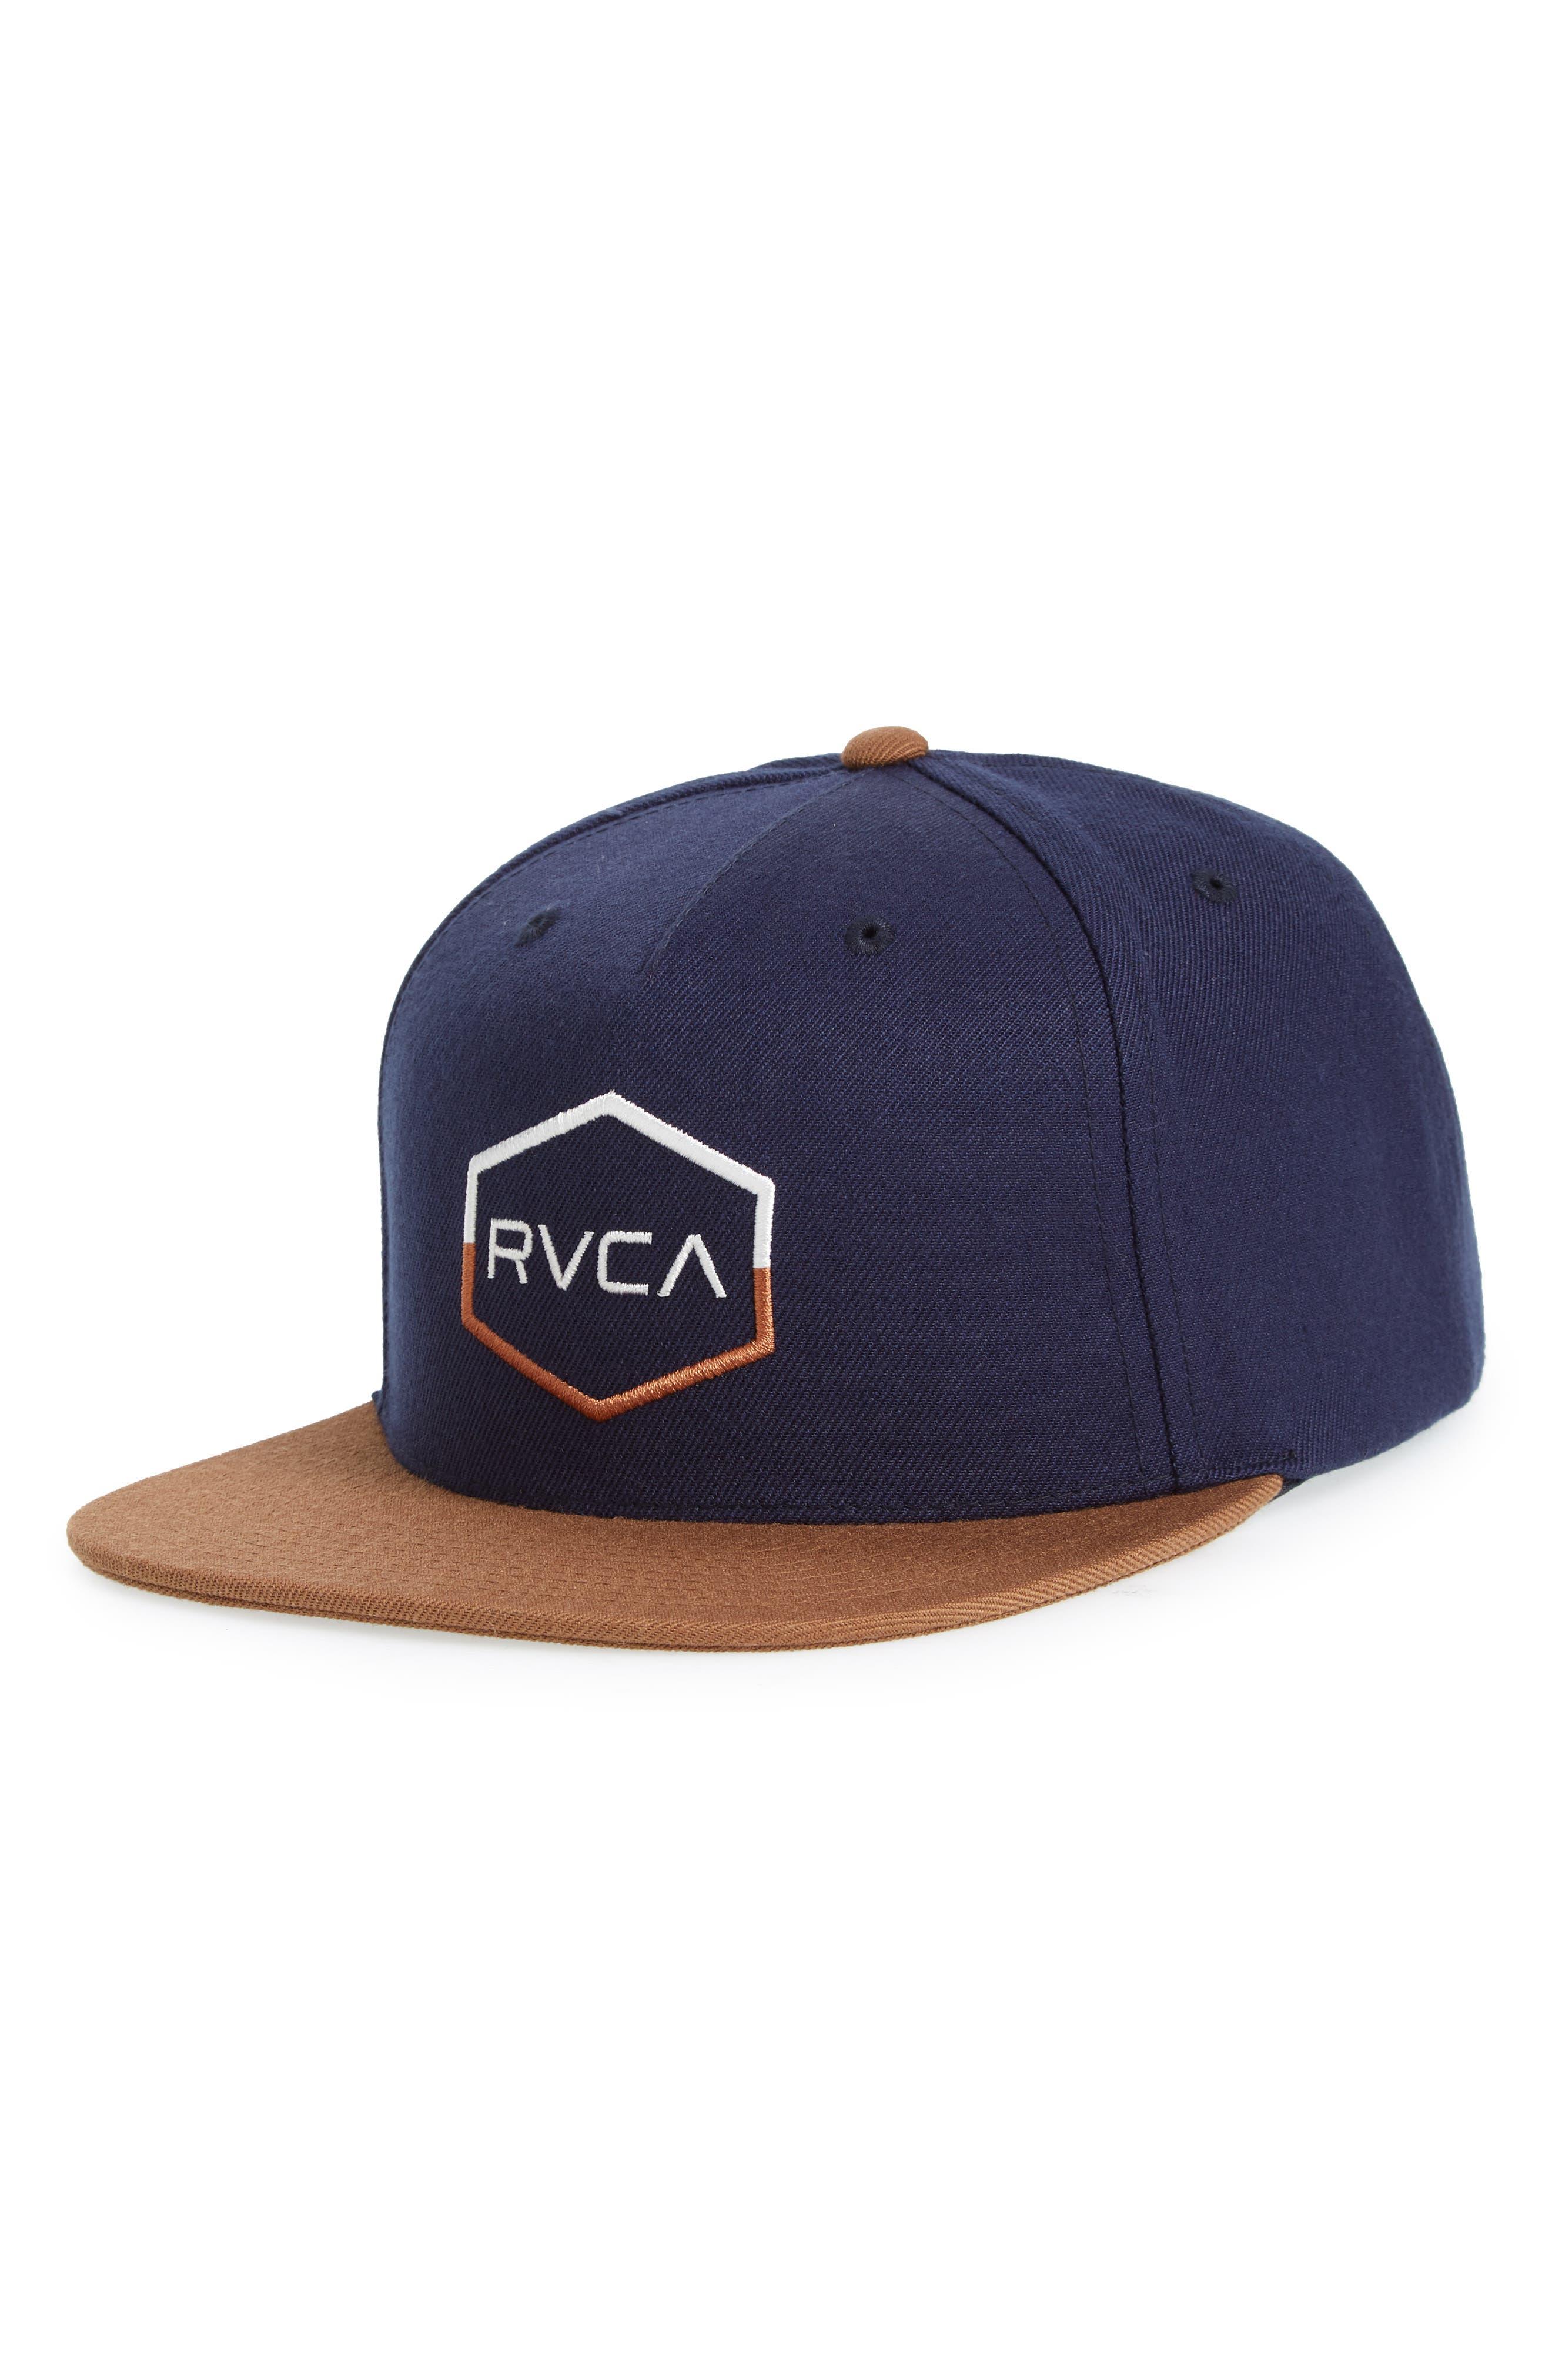 Commonwealth III Snapback Hat,                             Main thumbnail 1, color,                             Navy